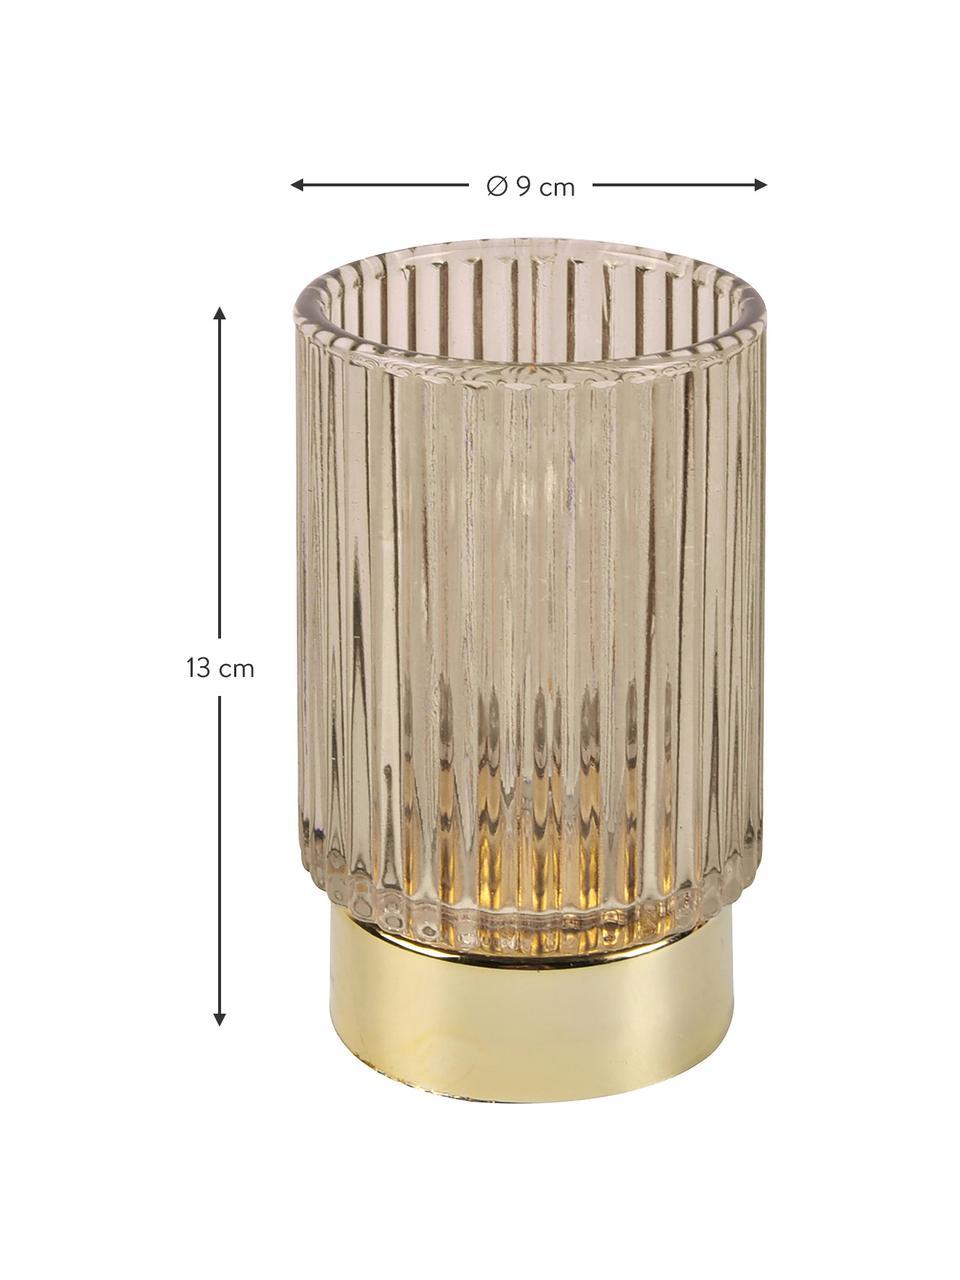 LED Teelichthalter Ribbed, Glas, Beige, Ø 9 x H 13 cm